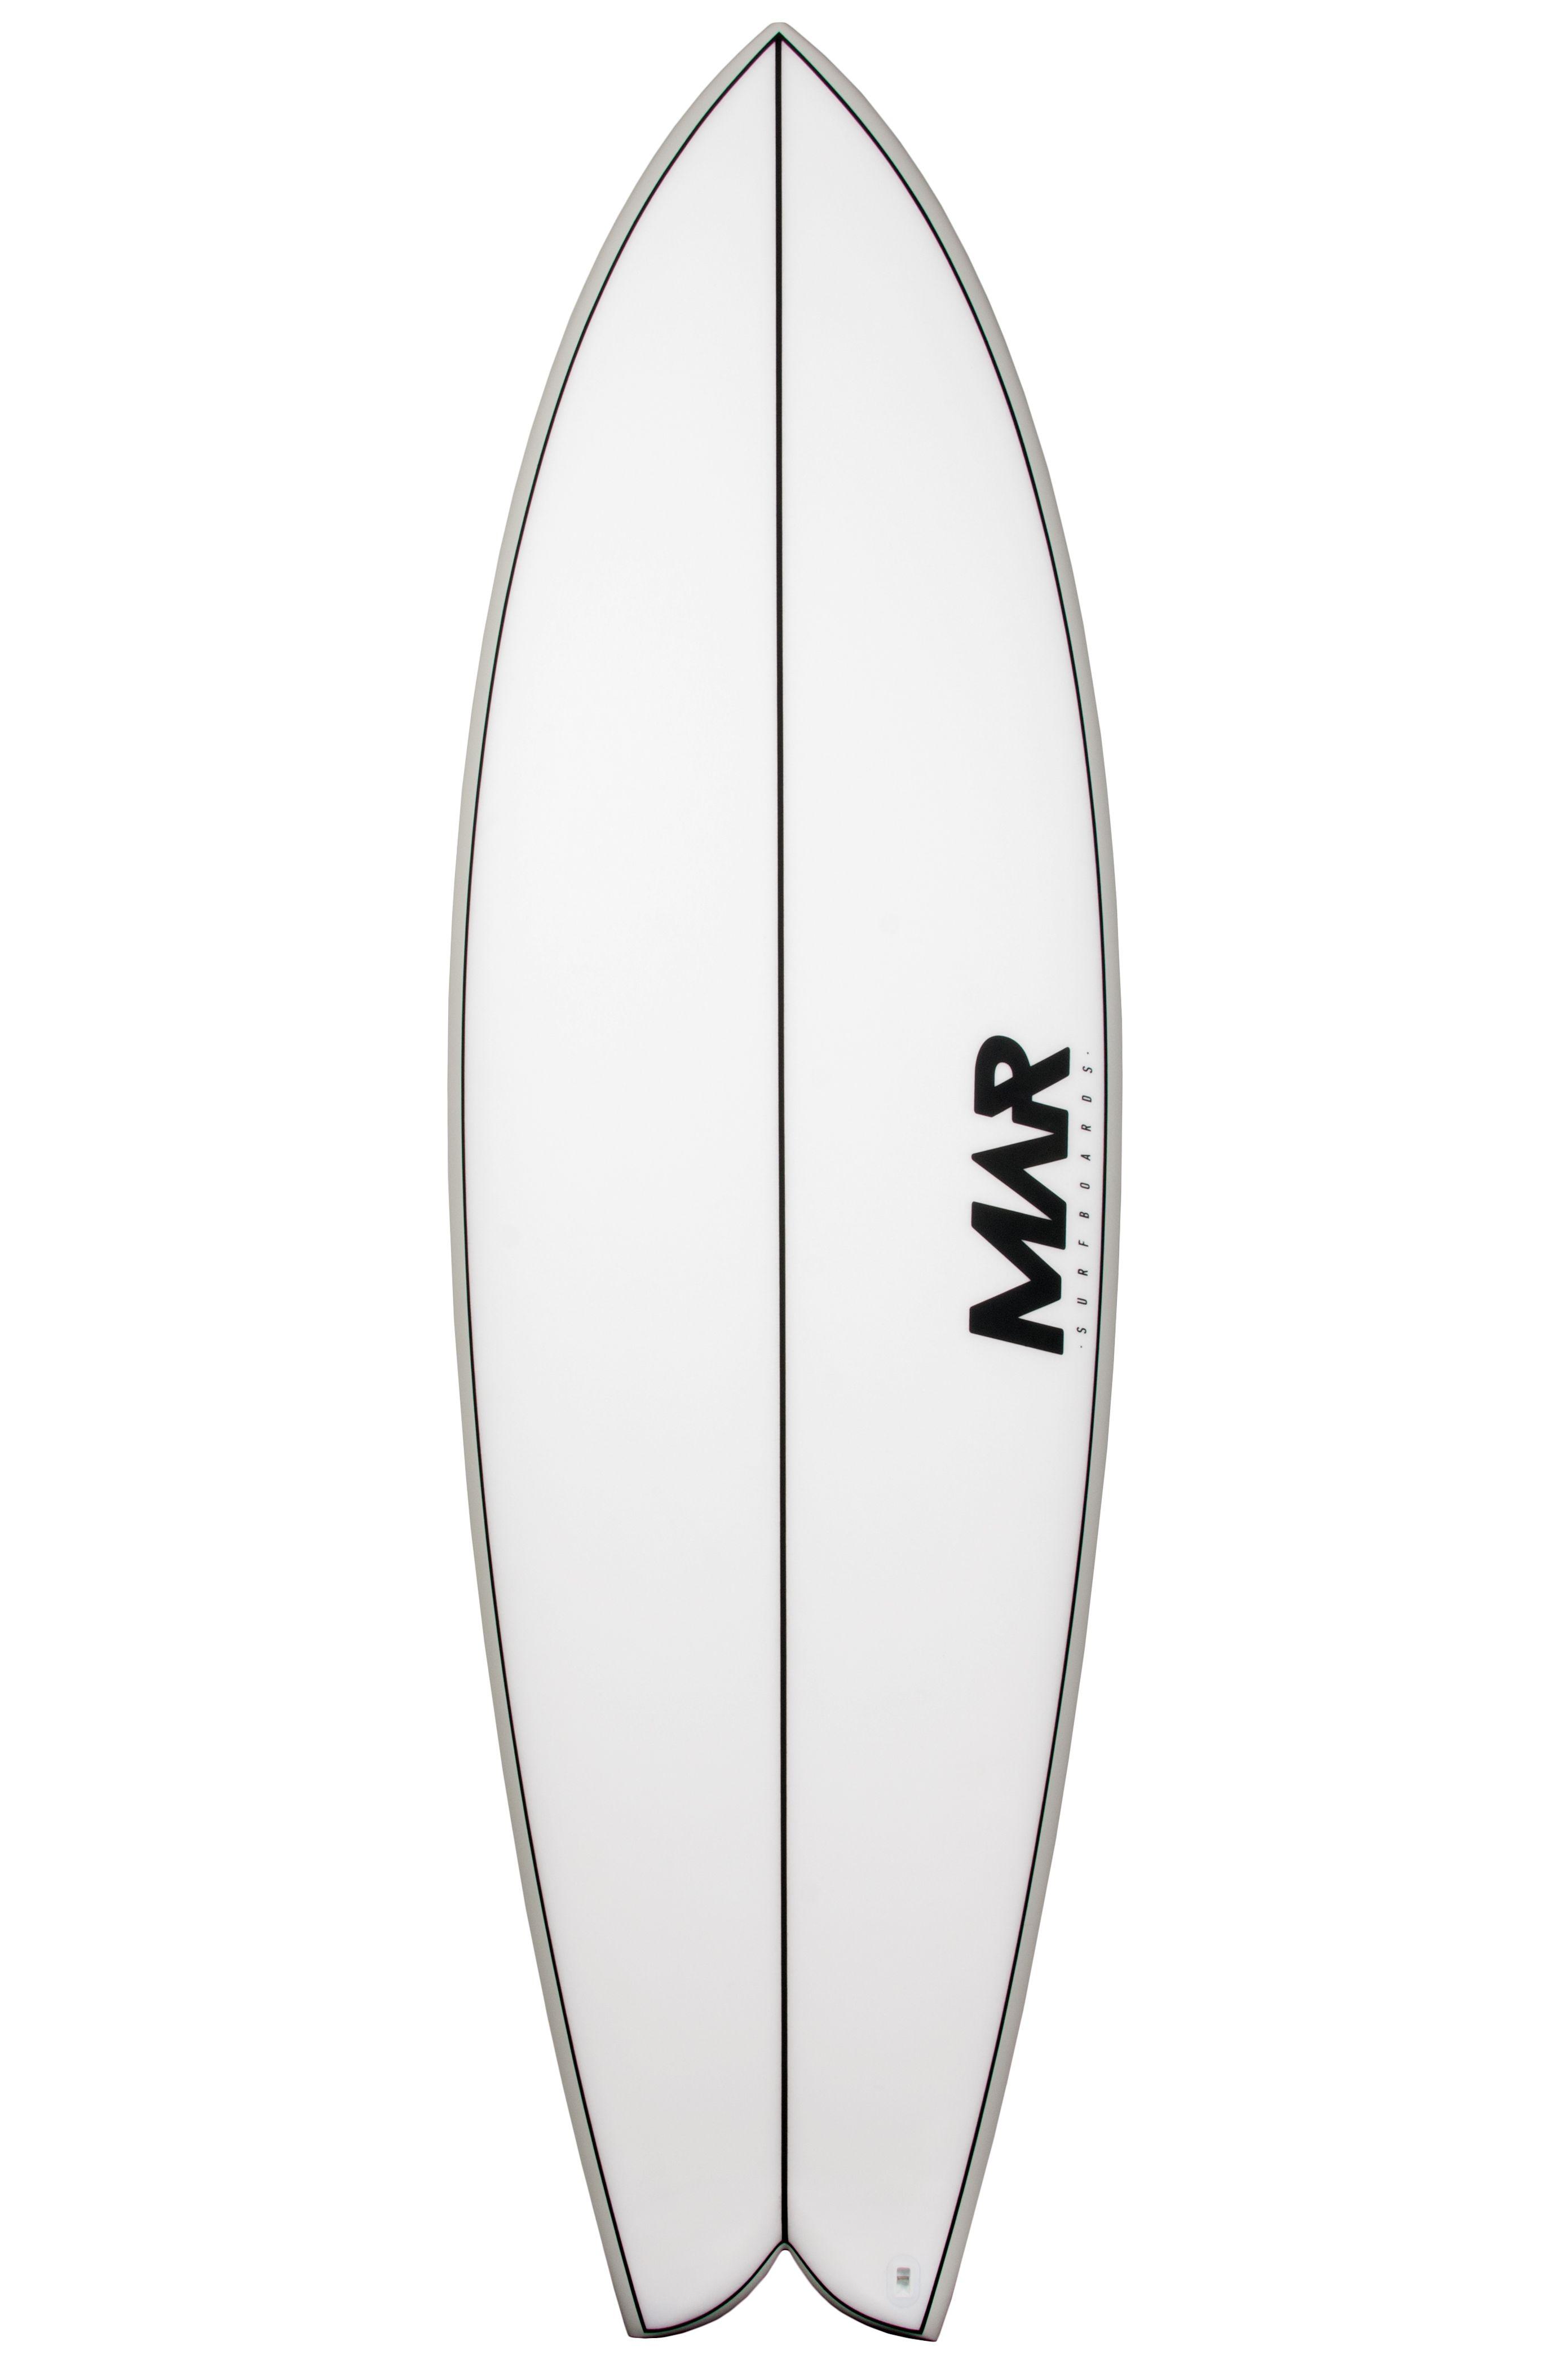 Mar Surf Board 6'0 MAR P2 XE Fish Tail - White FCS II Twin Tab 6ft0